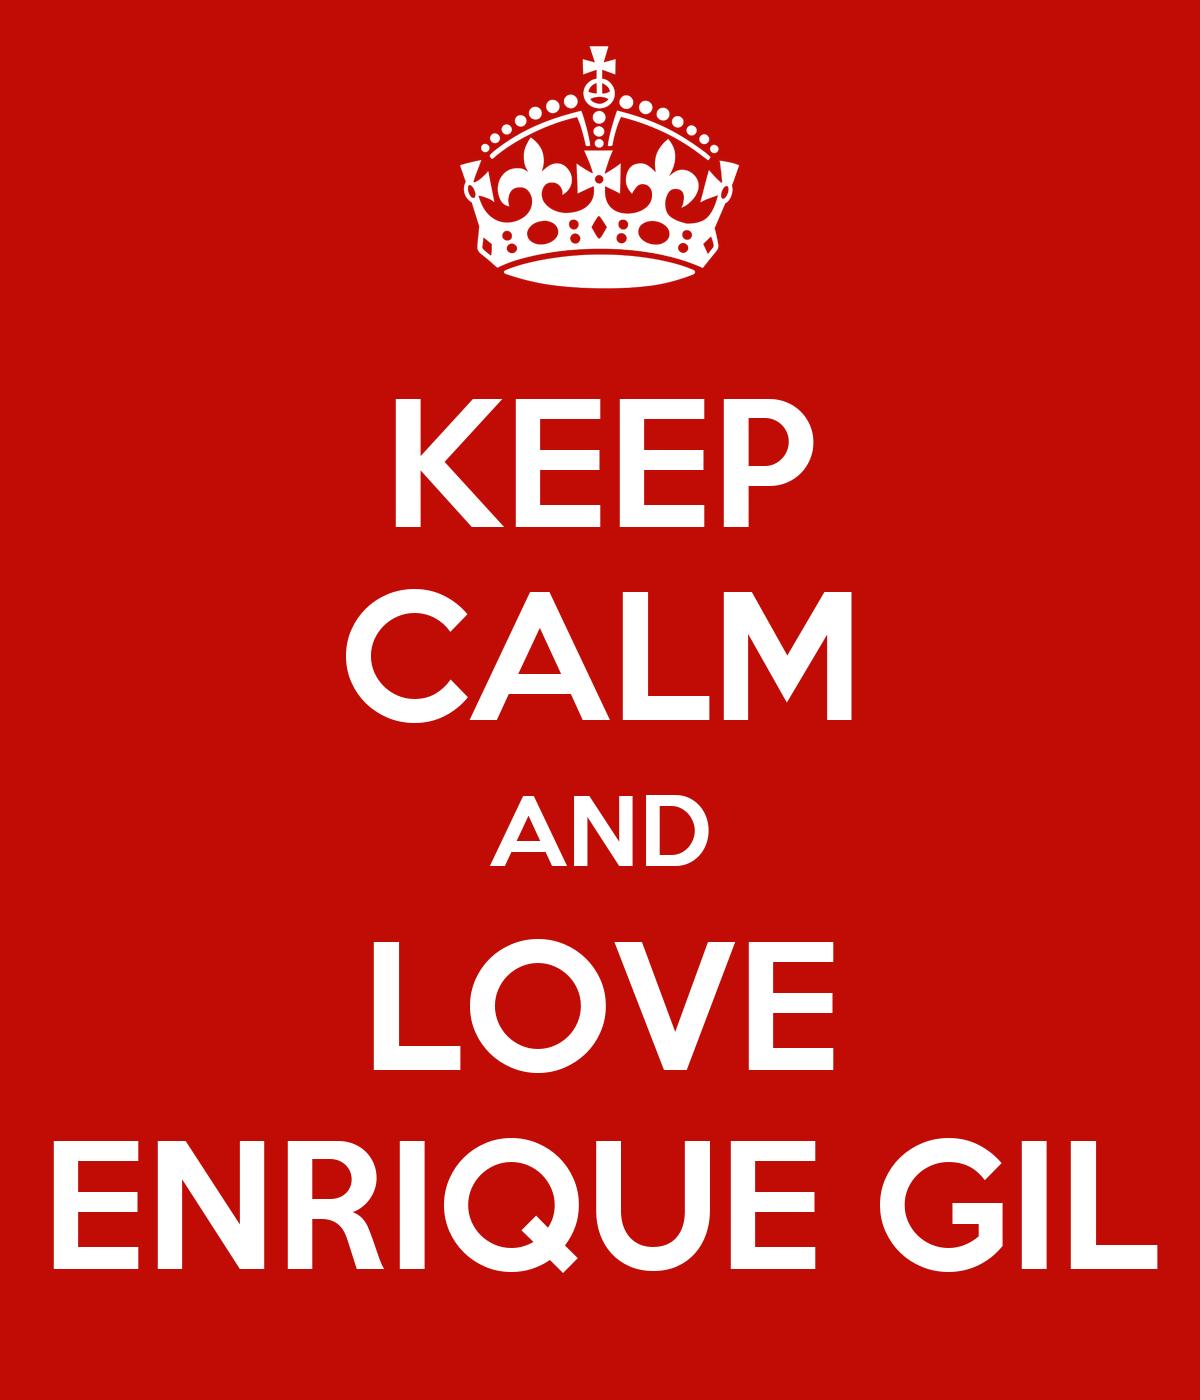 KEEP CALM AND LOVE ENRIQUE GIL